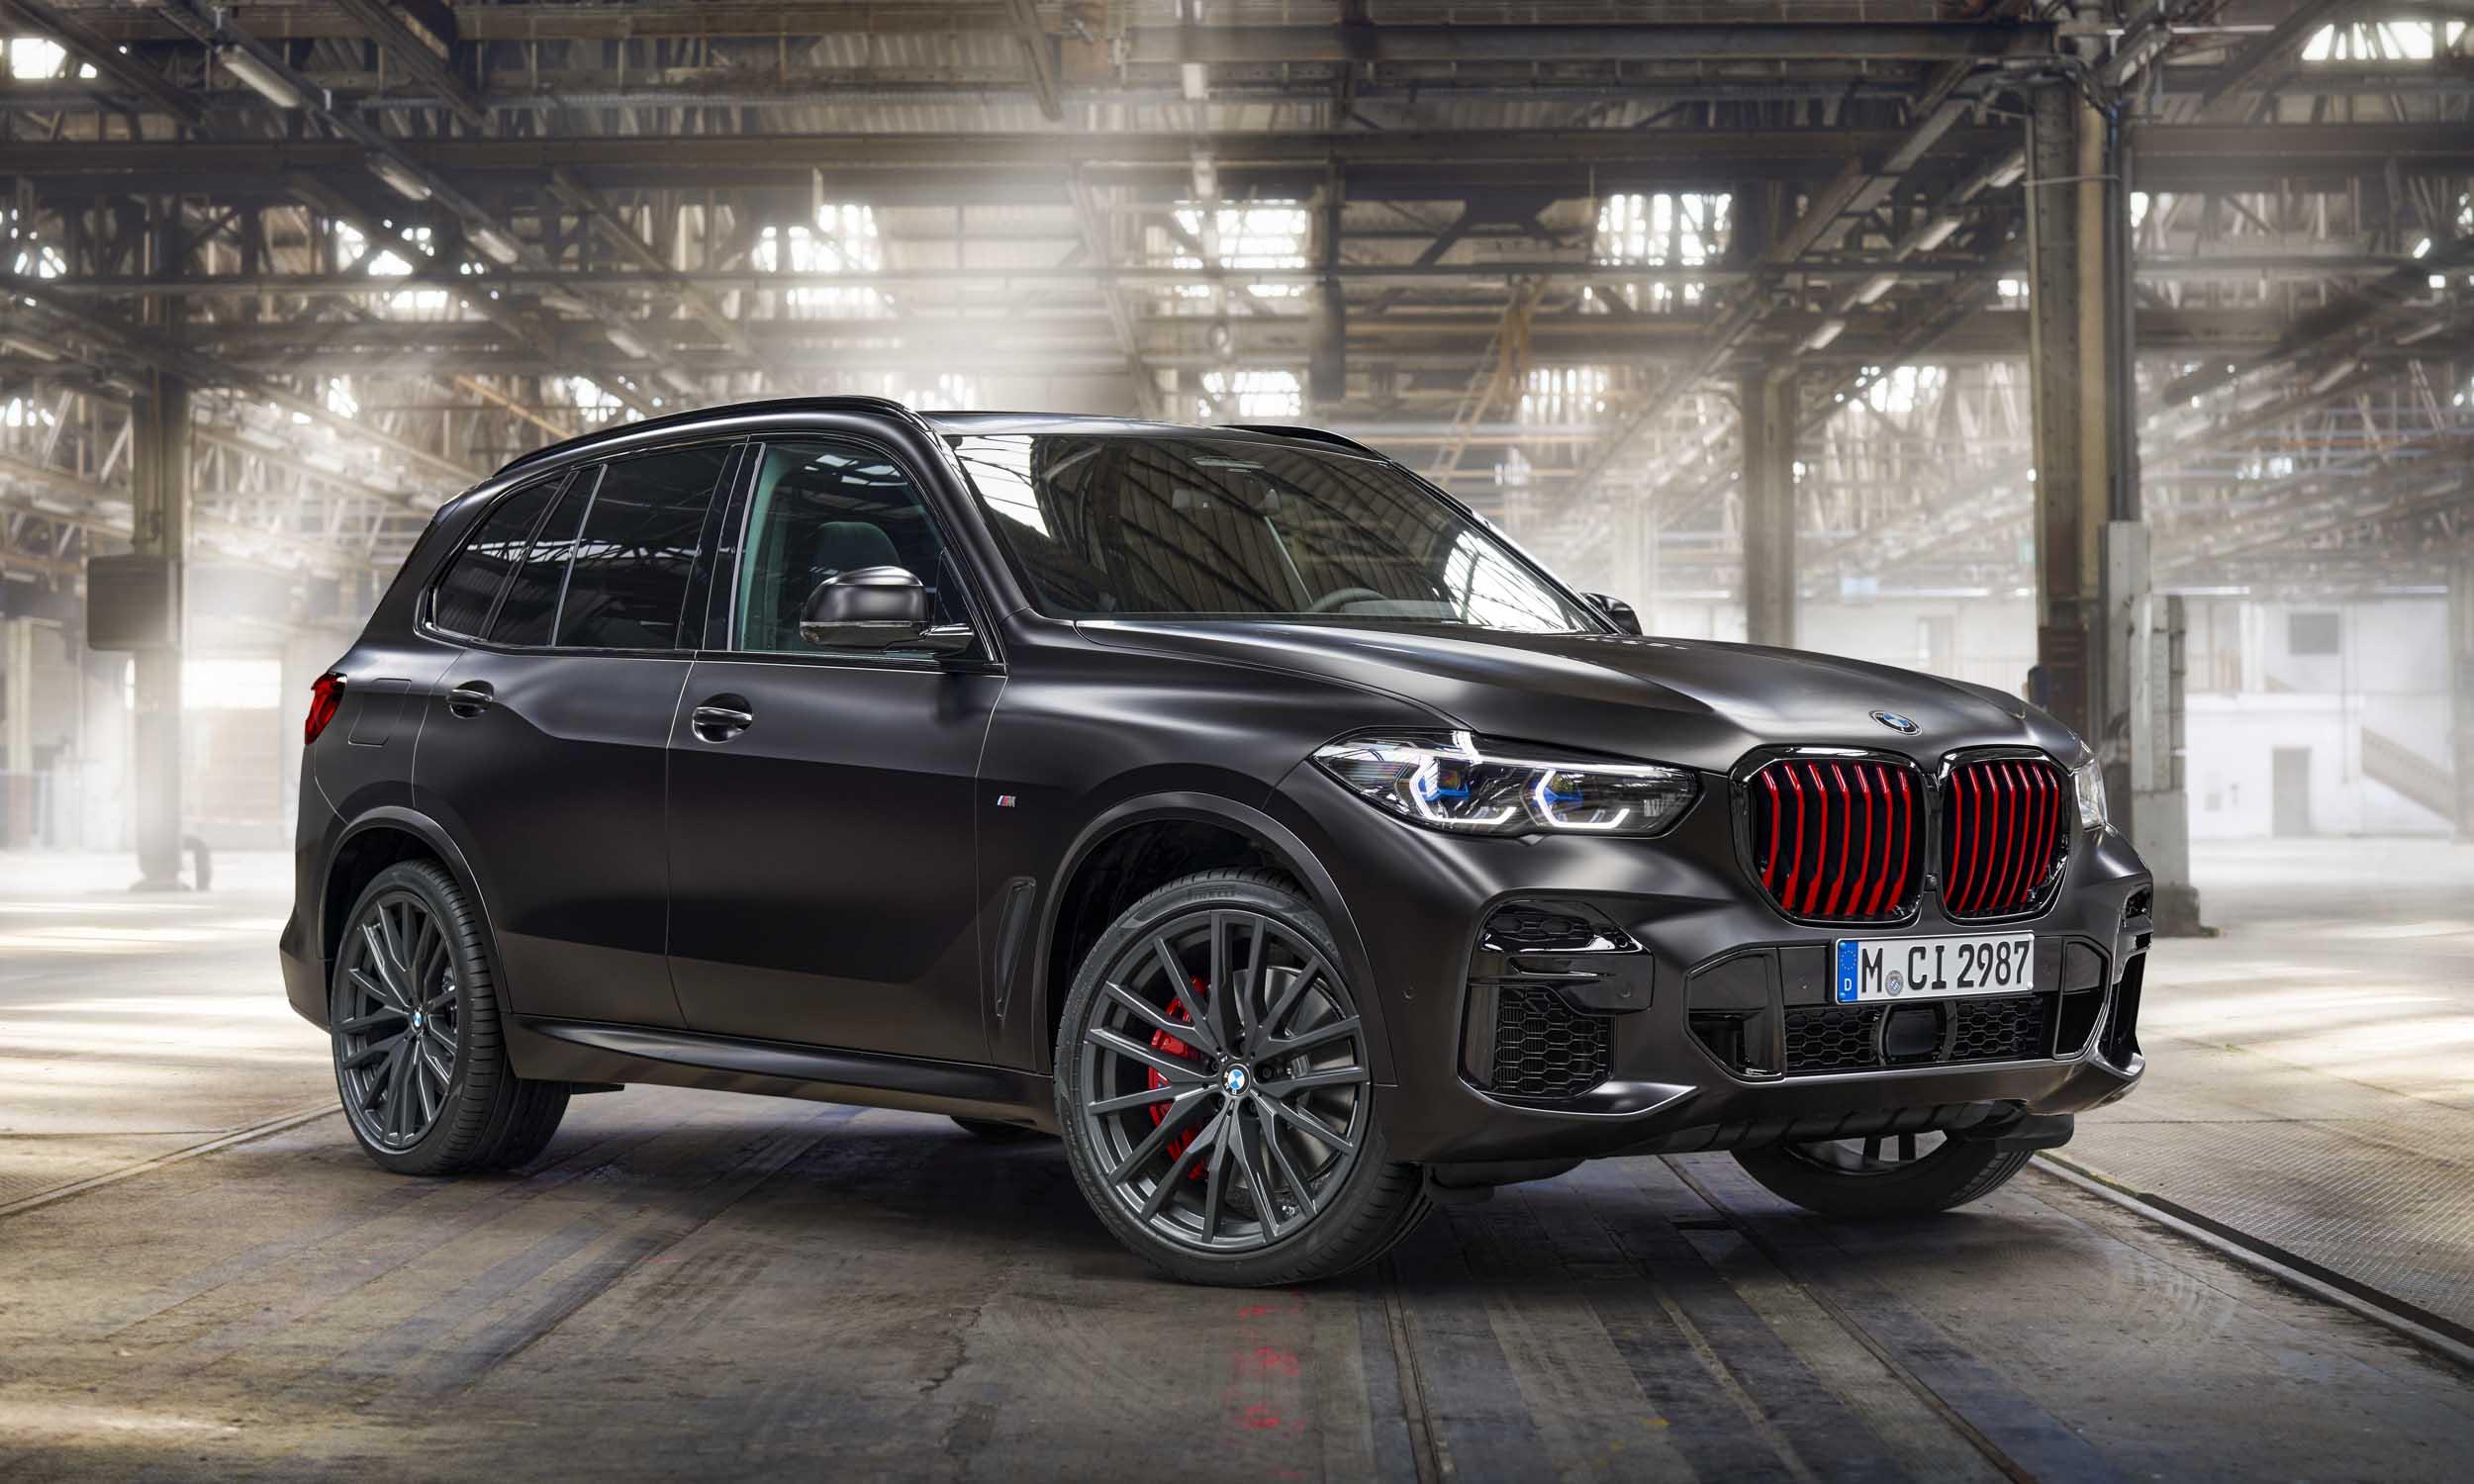 2022 BMW X5 Black Vermilion Edition: First Look